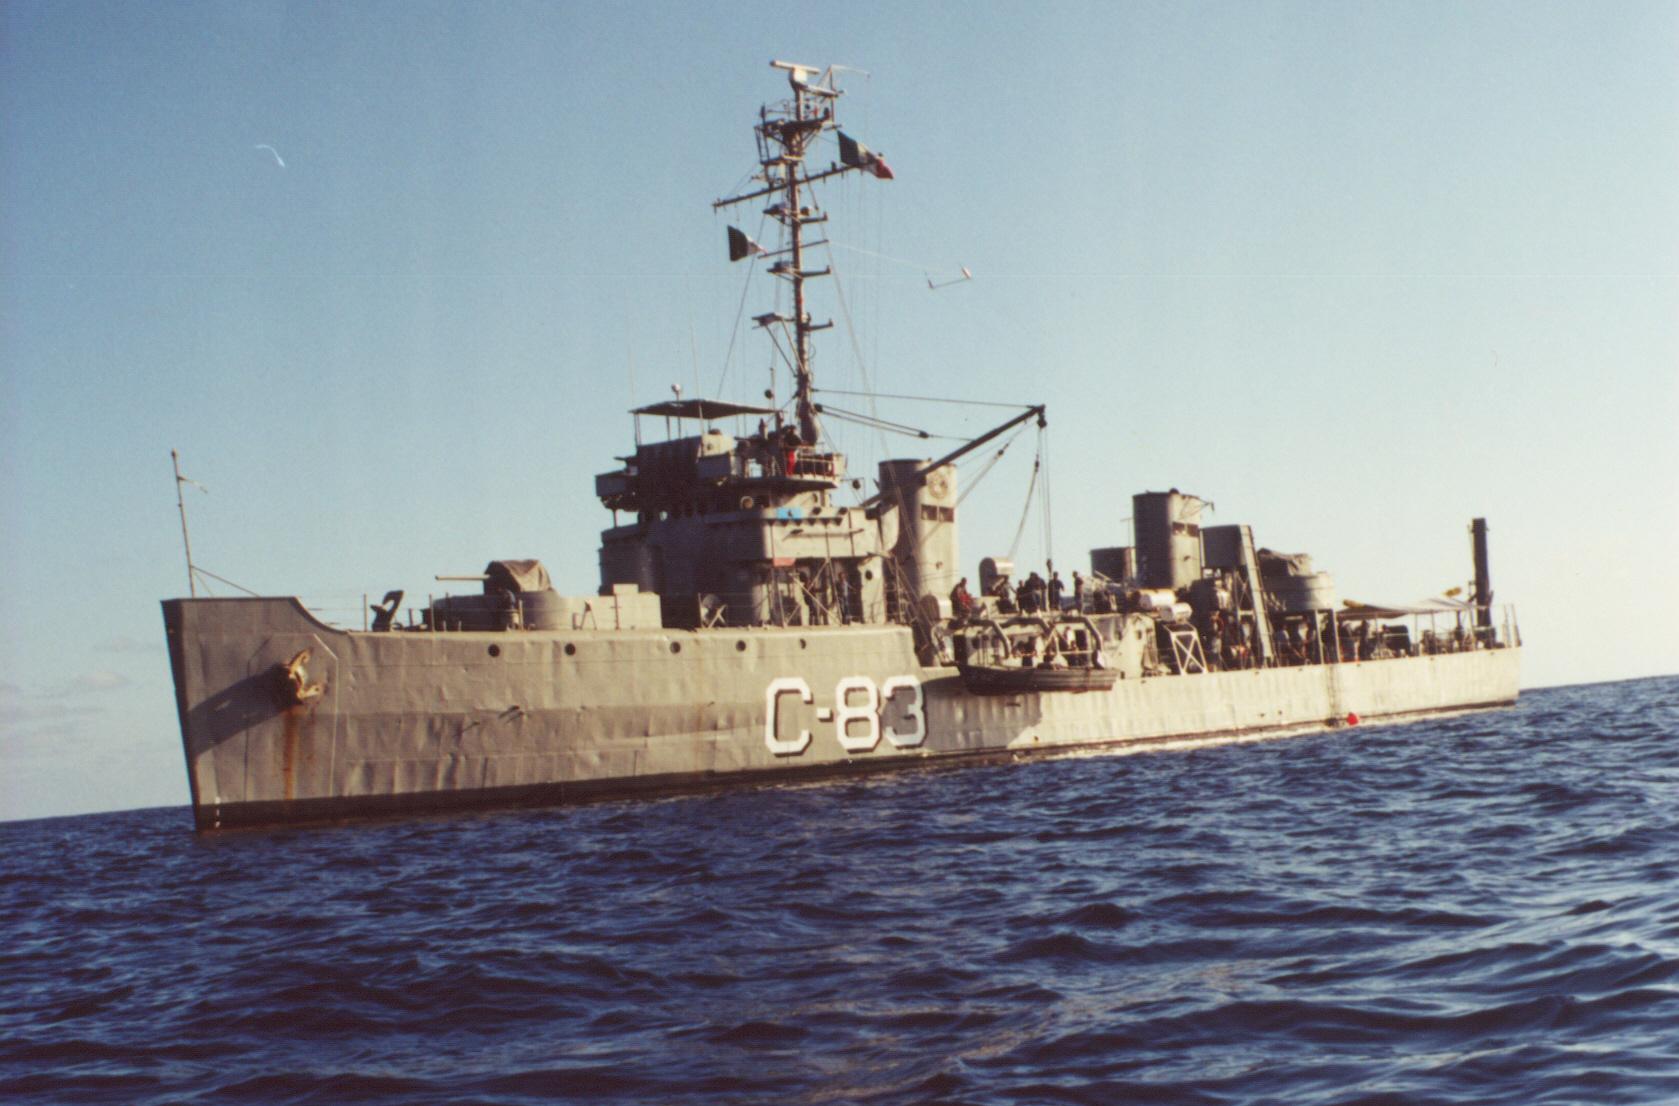 C-83 Capt Aldolphos ship.jpg